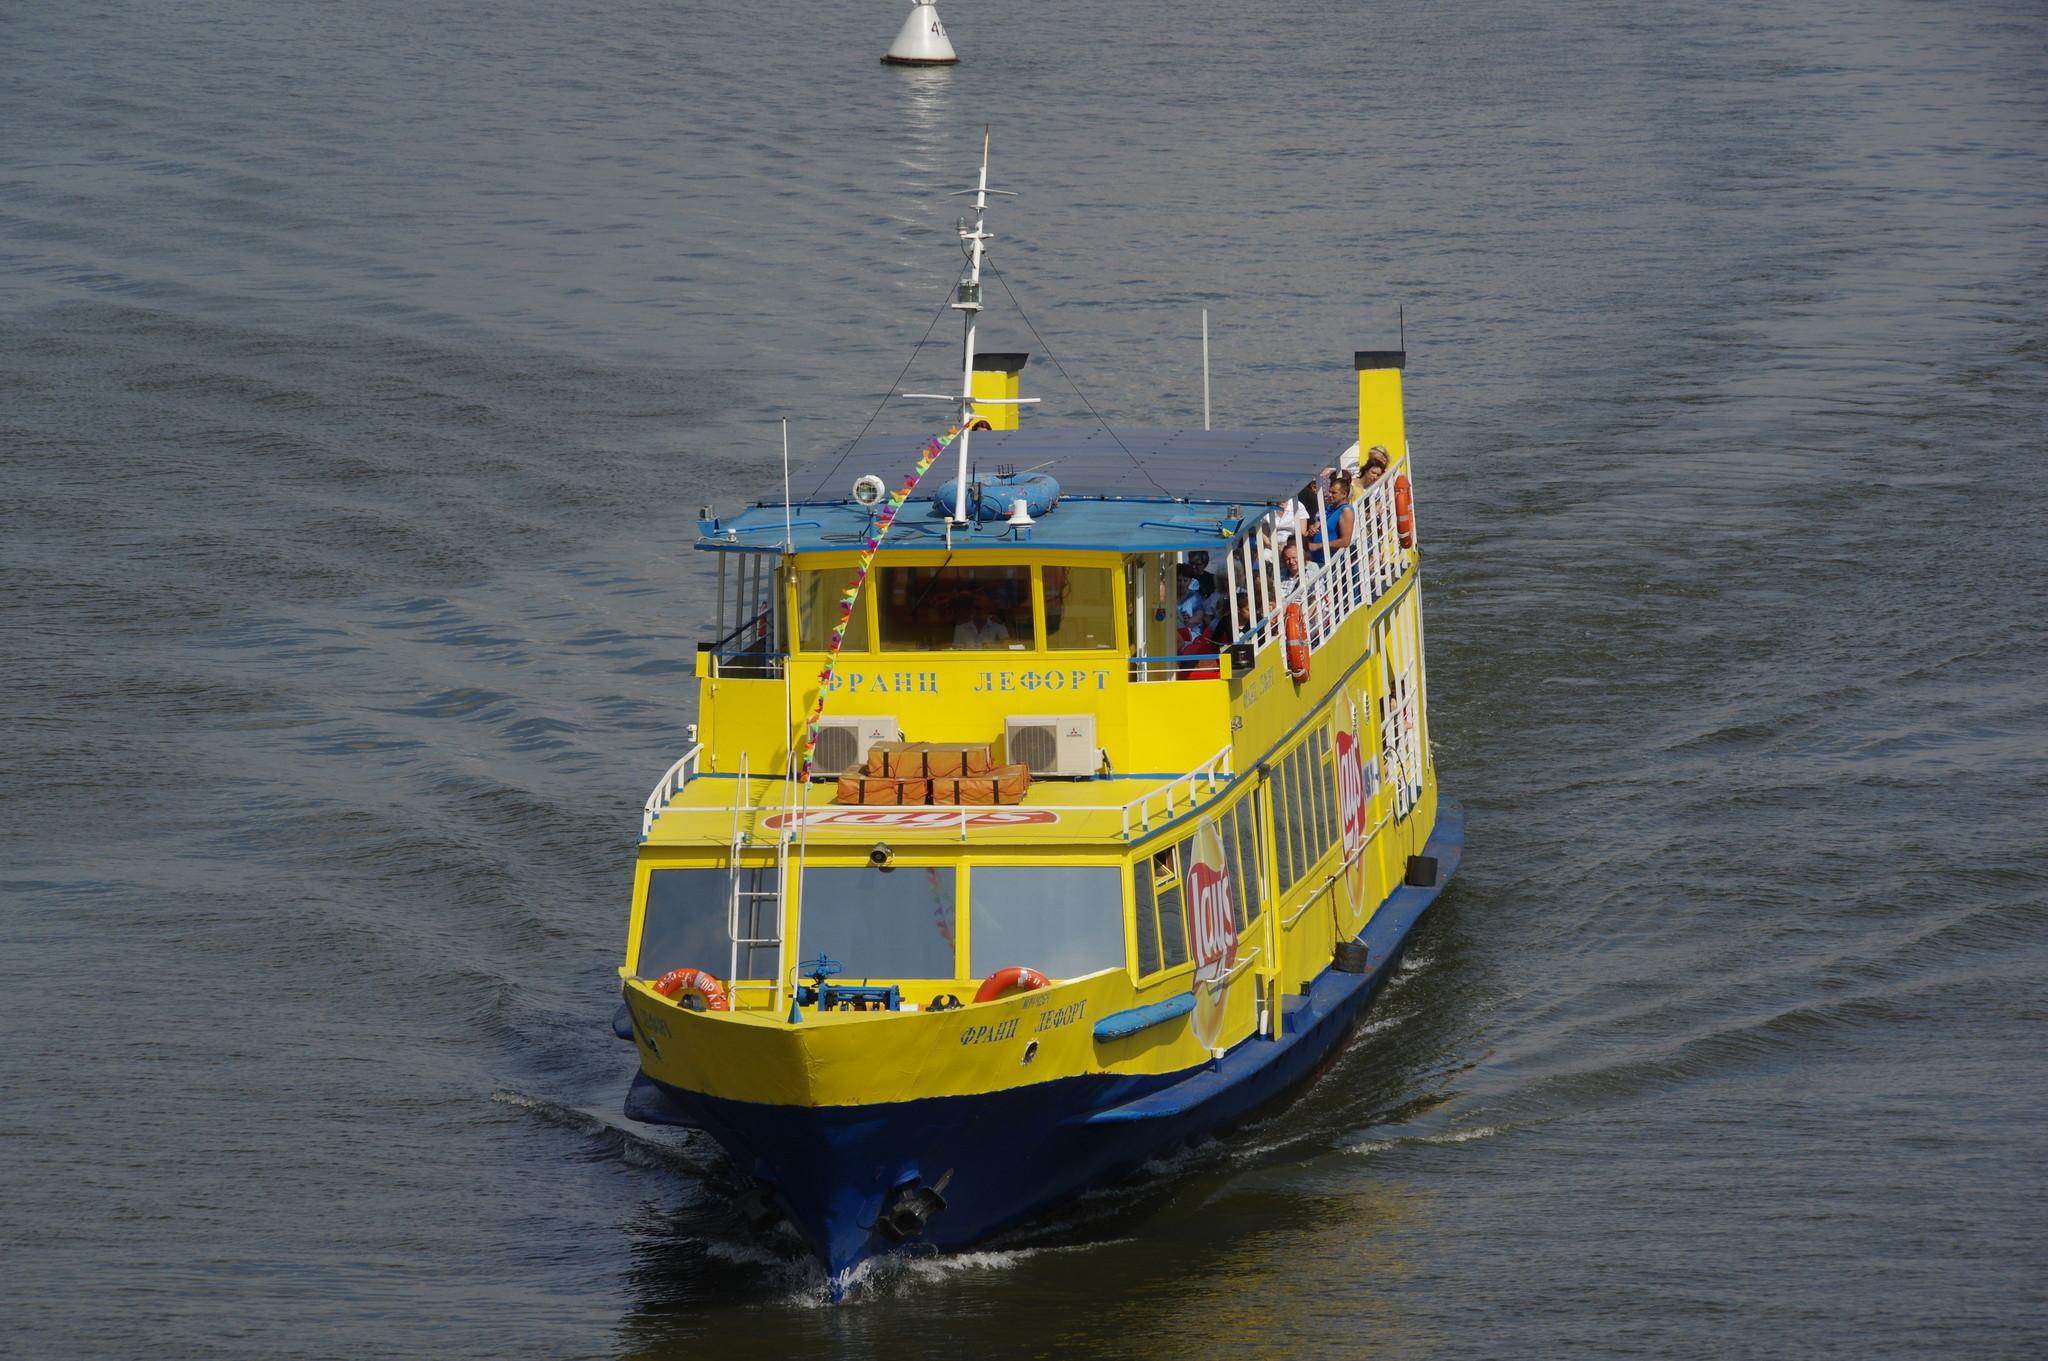 Теплоход «Франц Лефорт» (судно проекта 1430)